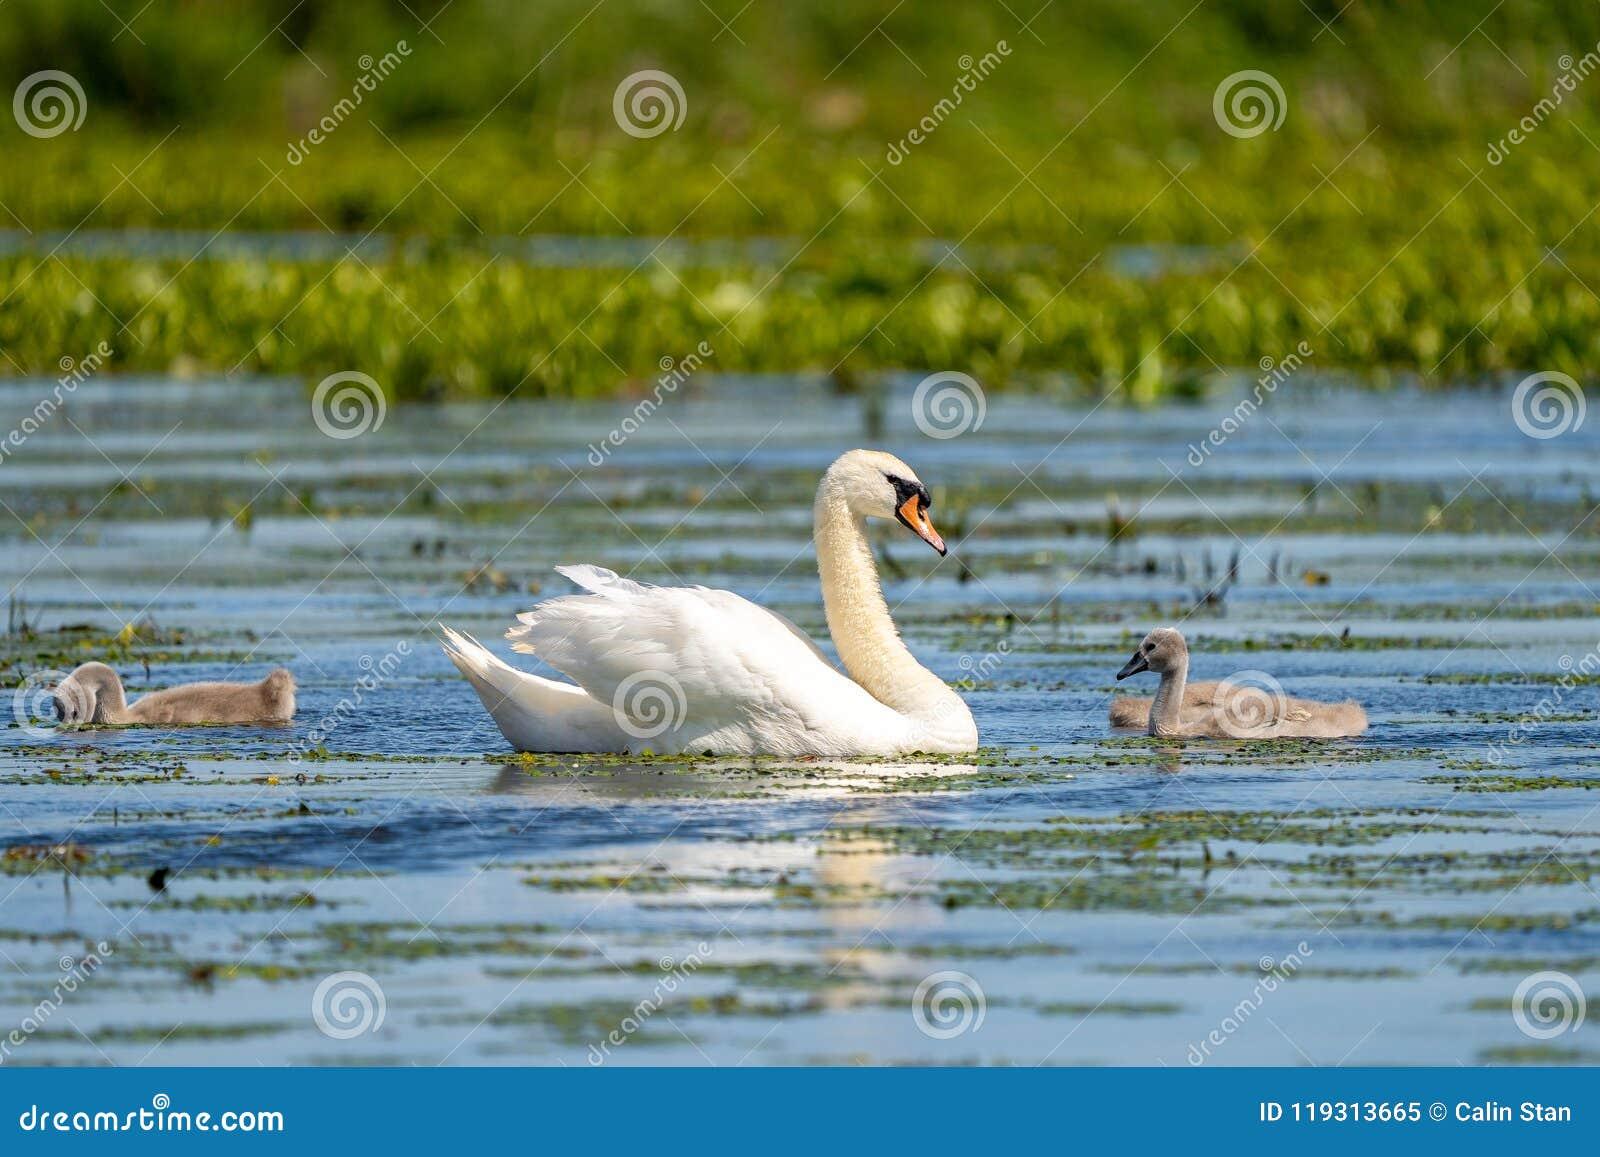 Cisne muda e Cygnets